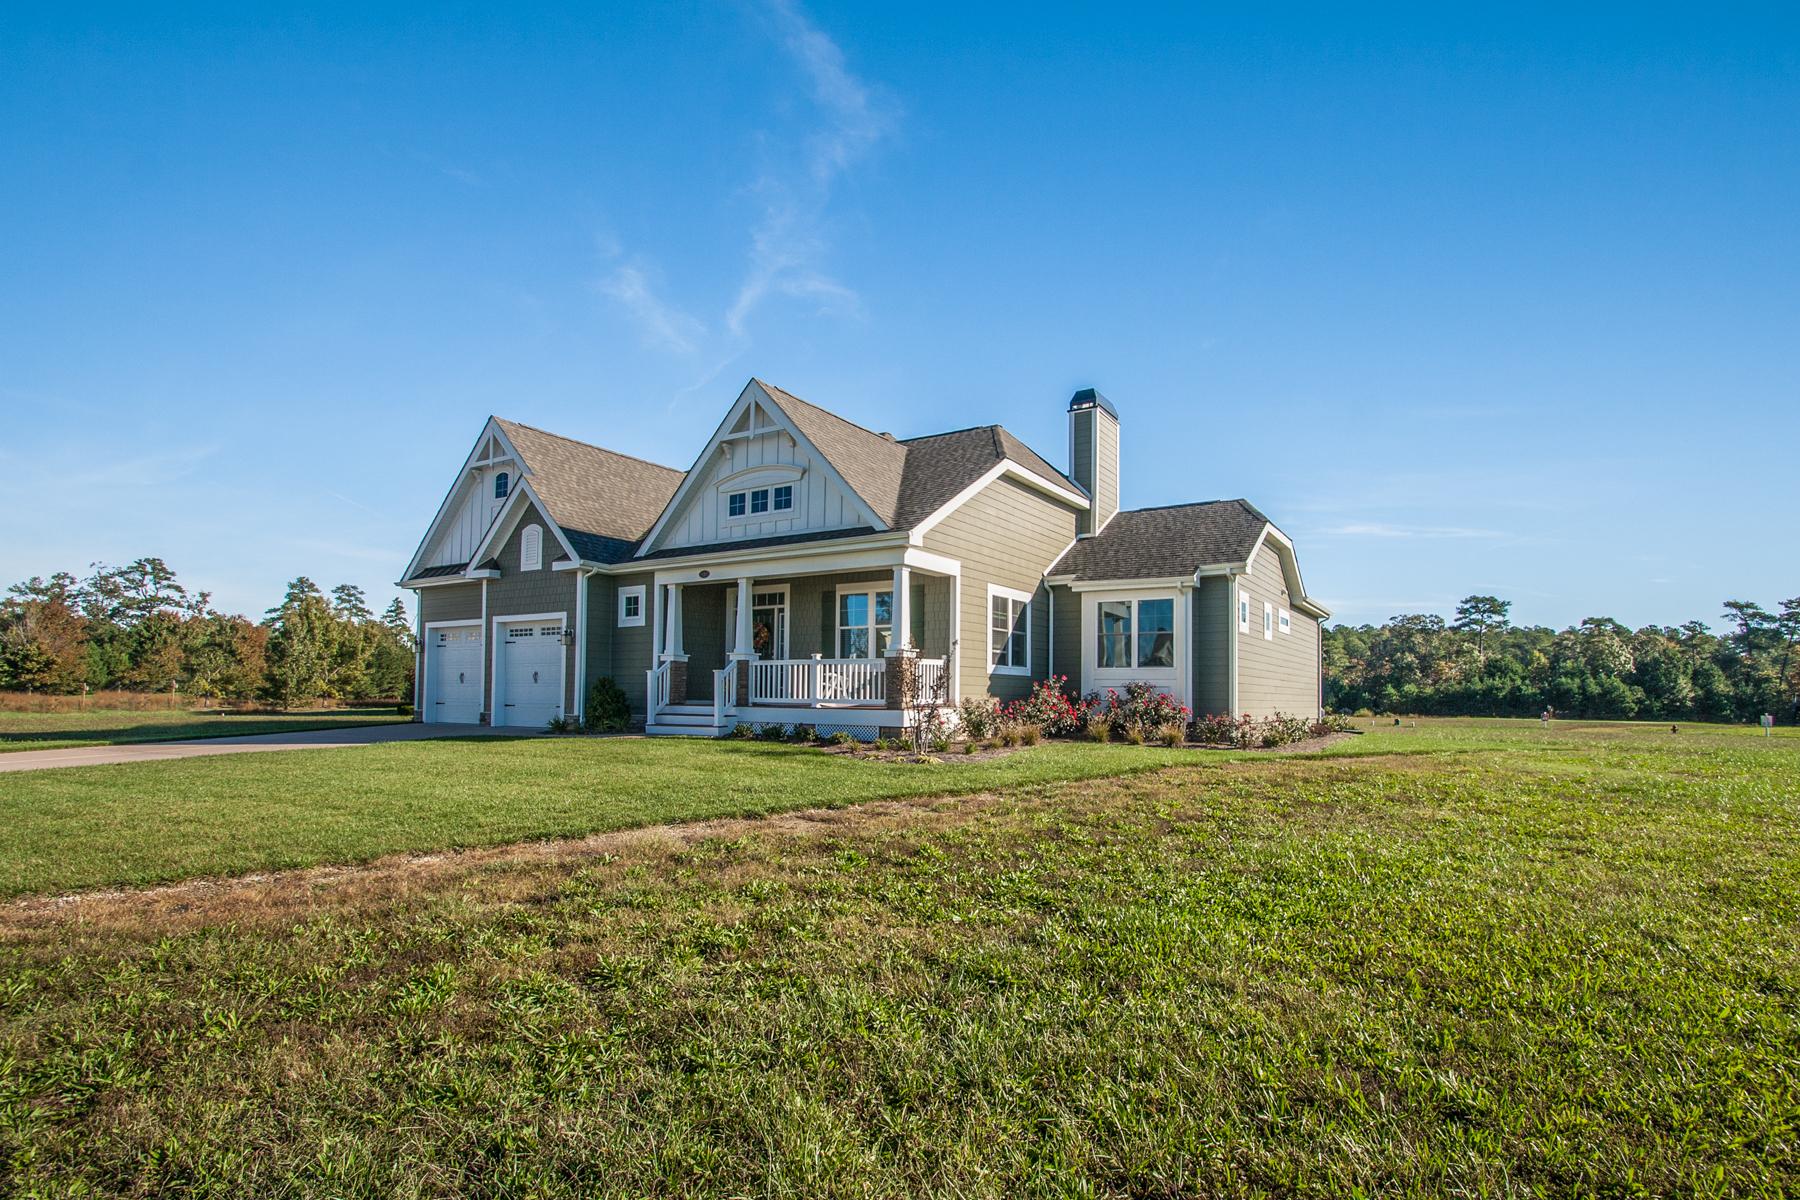 Property For Sale at 24562 Atlantic Drive , Millsboro, DE 19966